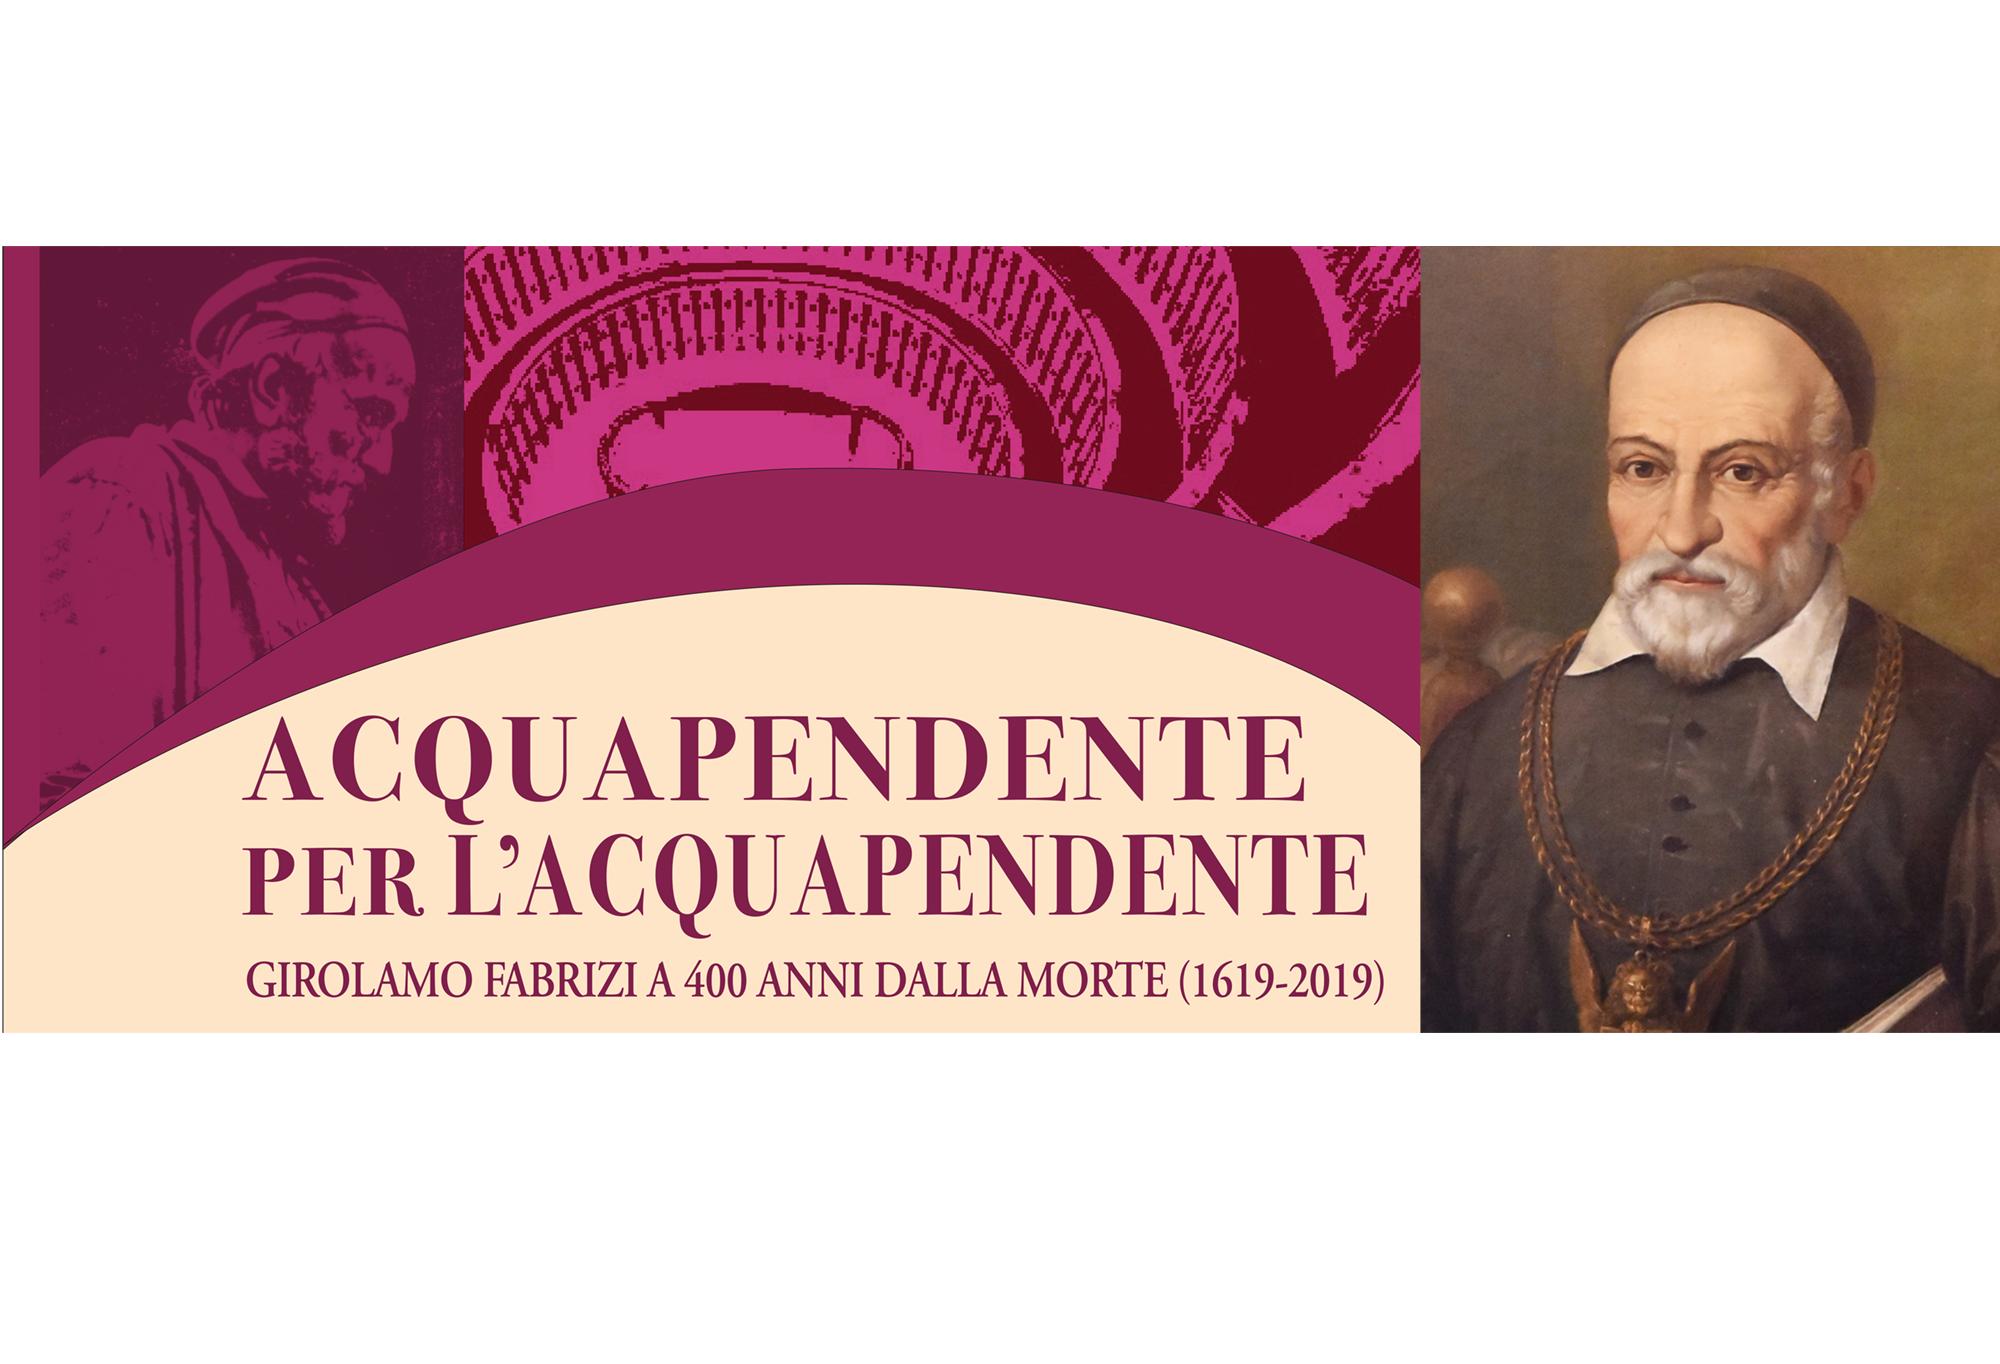 Girolamo Fabrizi L'Acquapendente